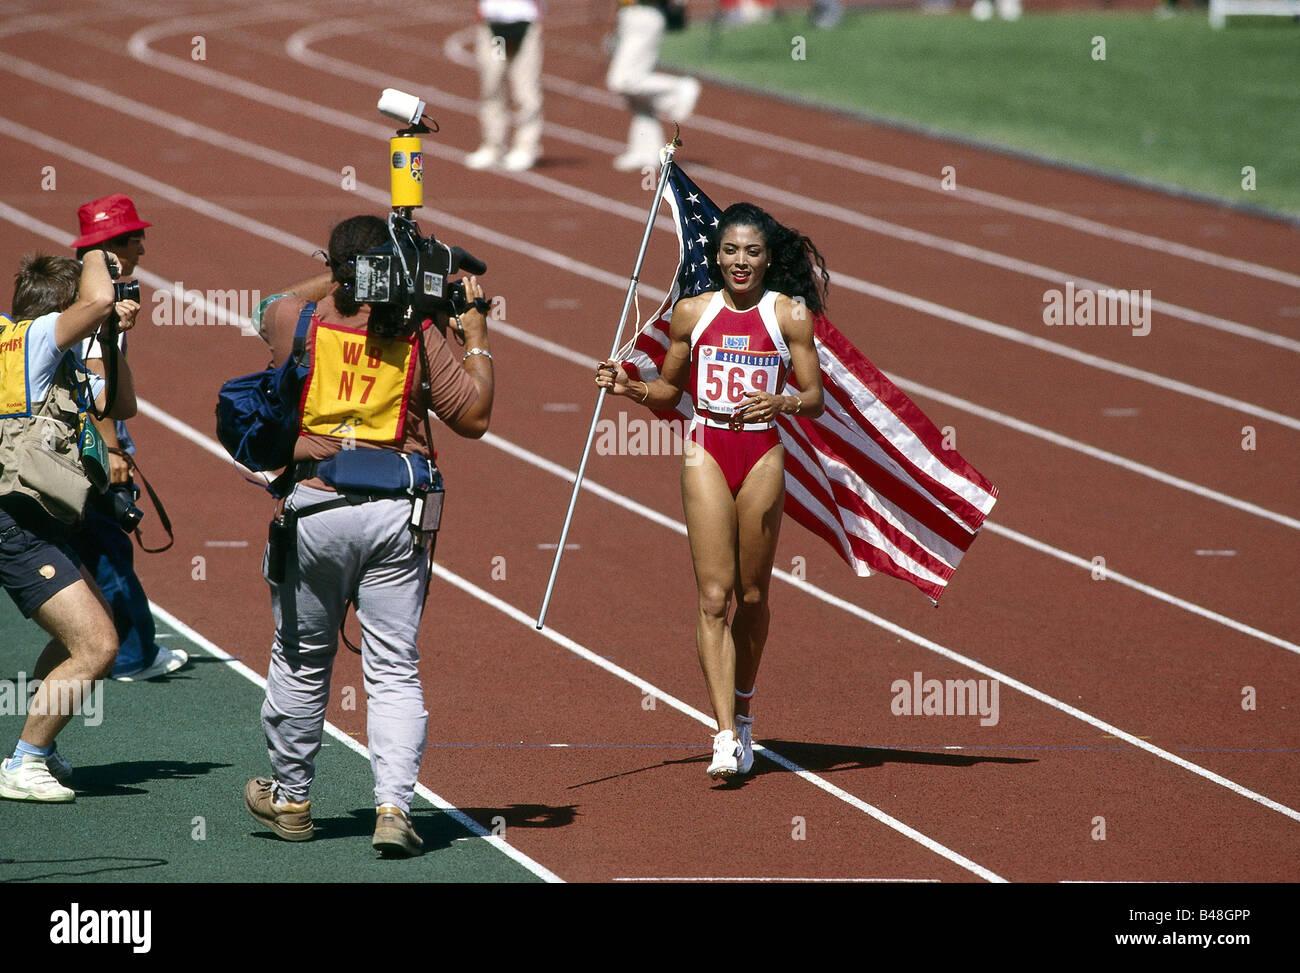 Griffith-Joyner, Florence, 21.12.1959 - 21.9.1998, American athlete (athletics), full length, Olympic Games, Seoul, - Stock Image